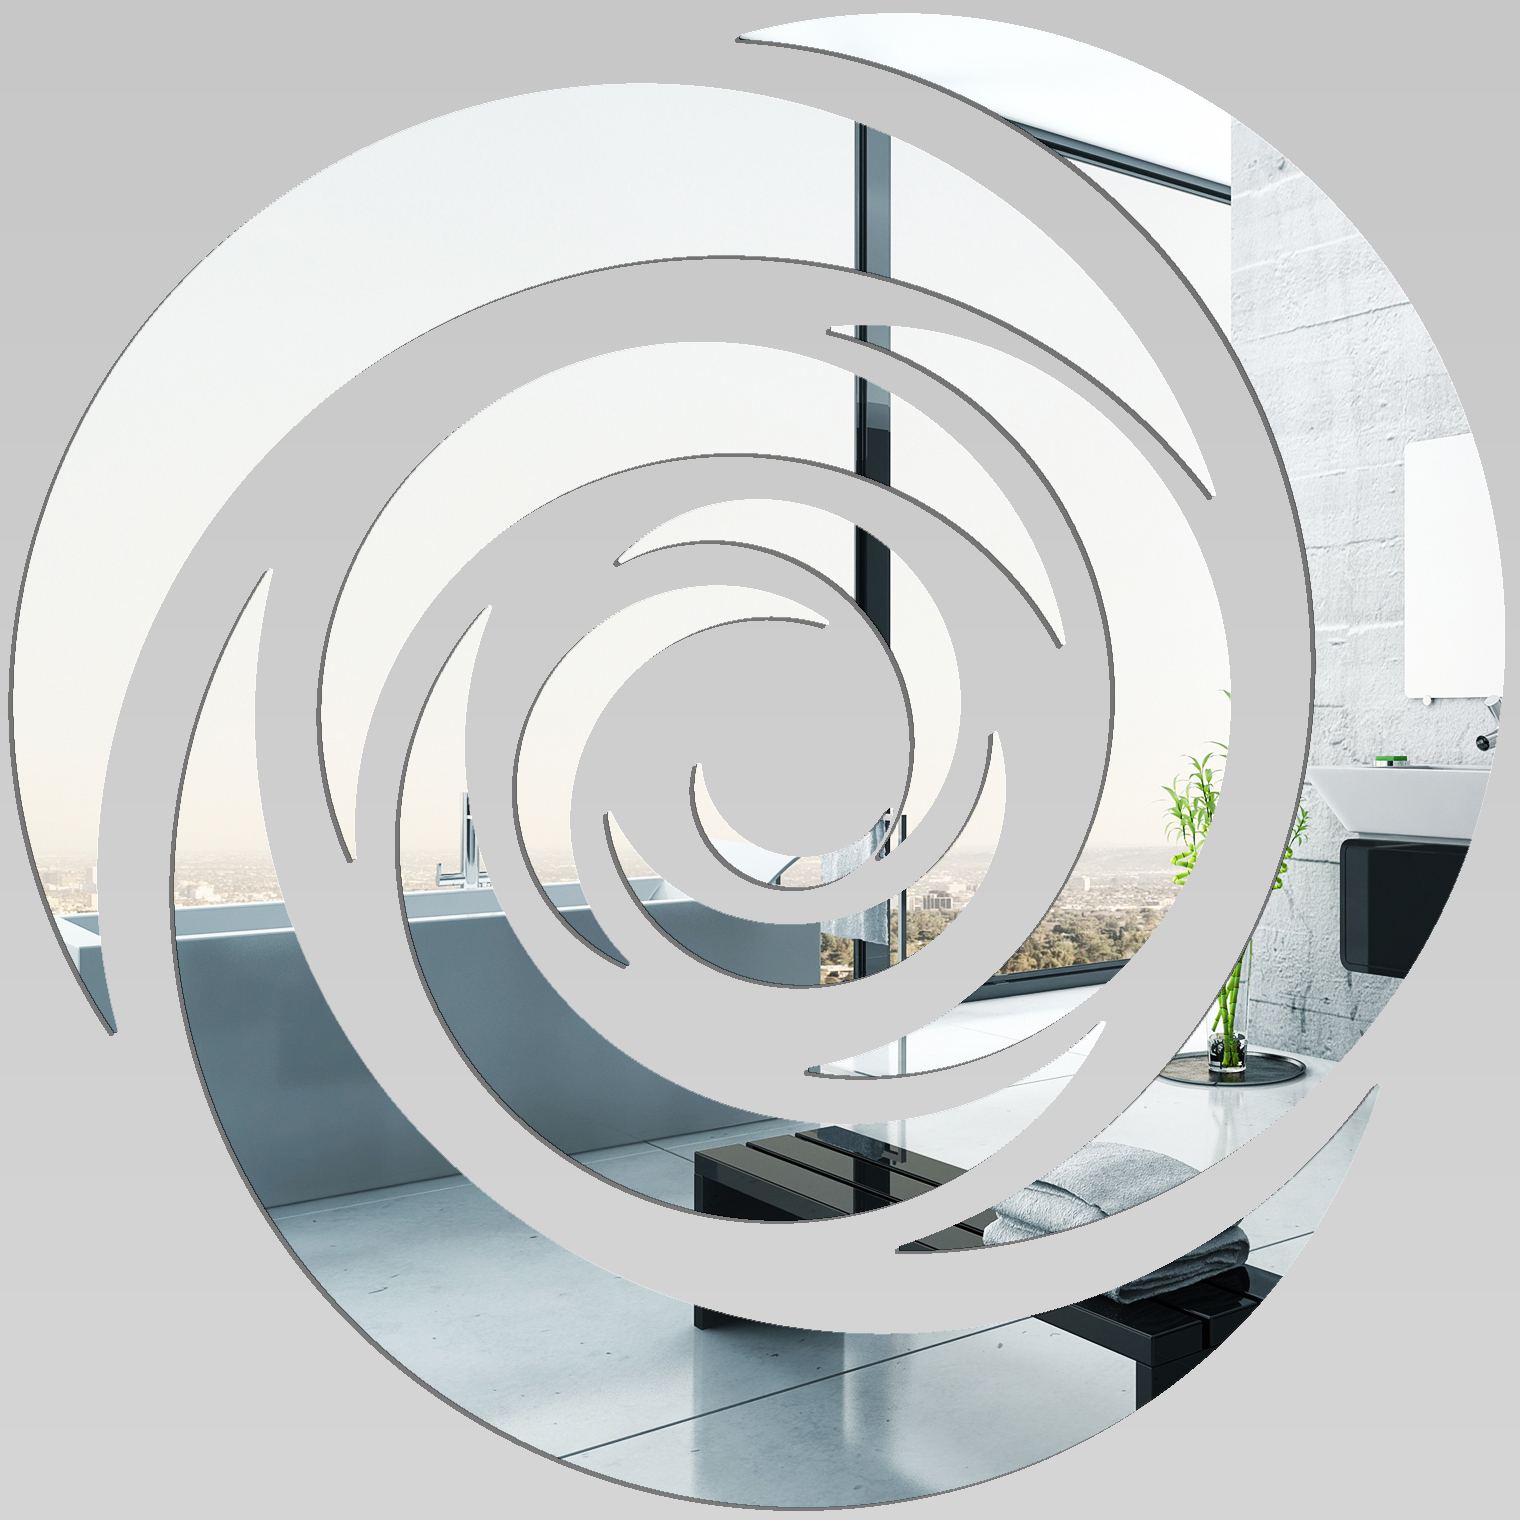 Miroir plexiglass acrylique rose design pas cher for Miroir salon design pas cher